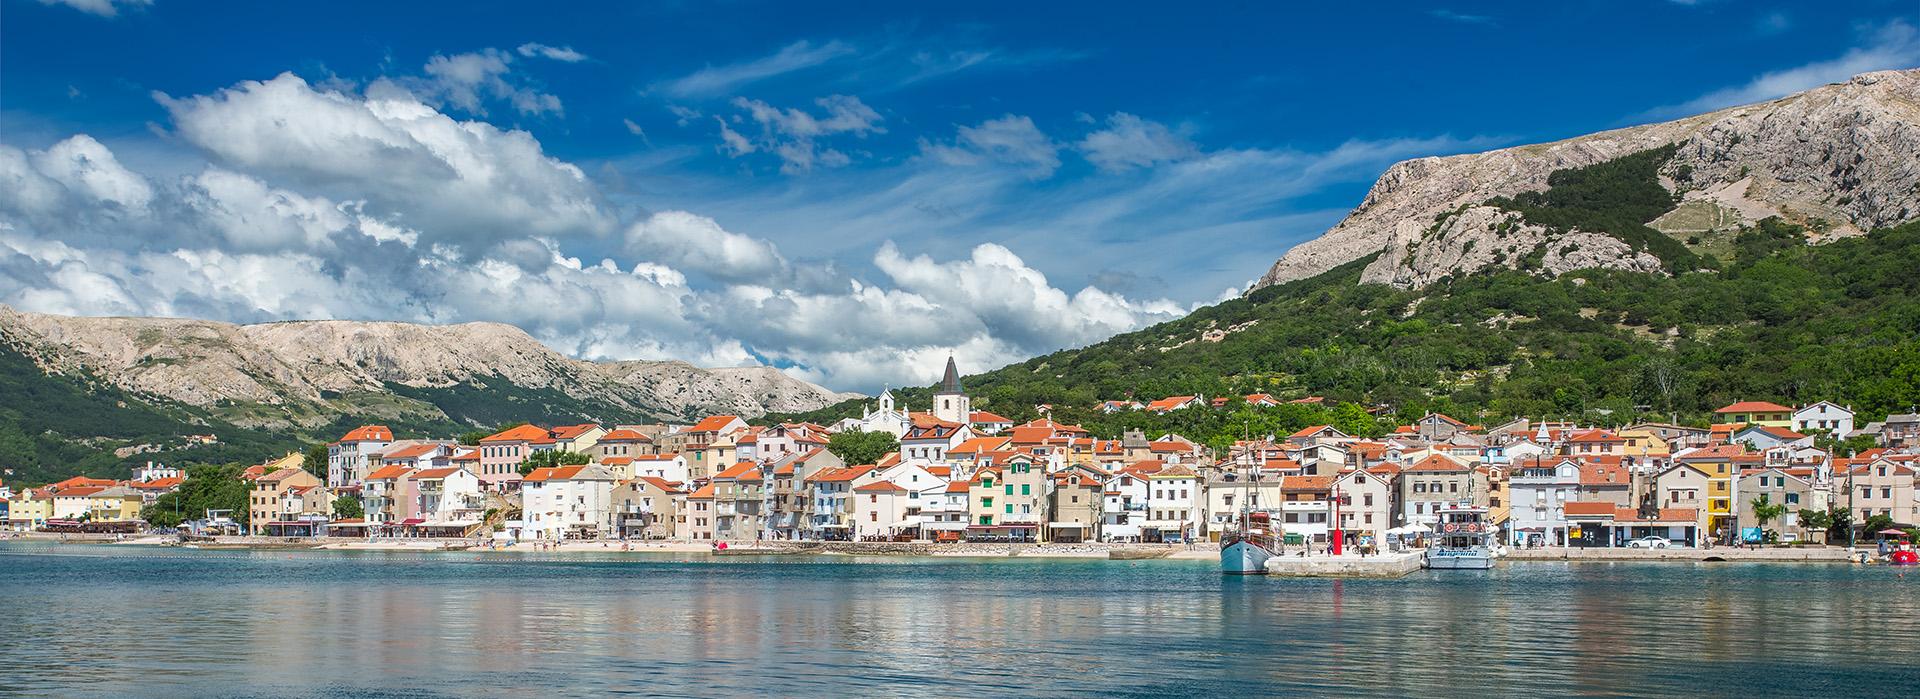 Baska, Isola di Krk - Croazia